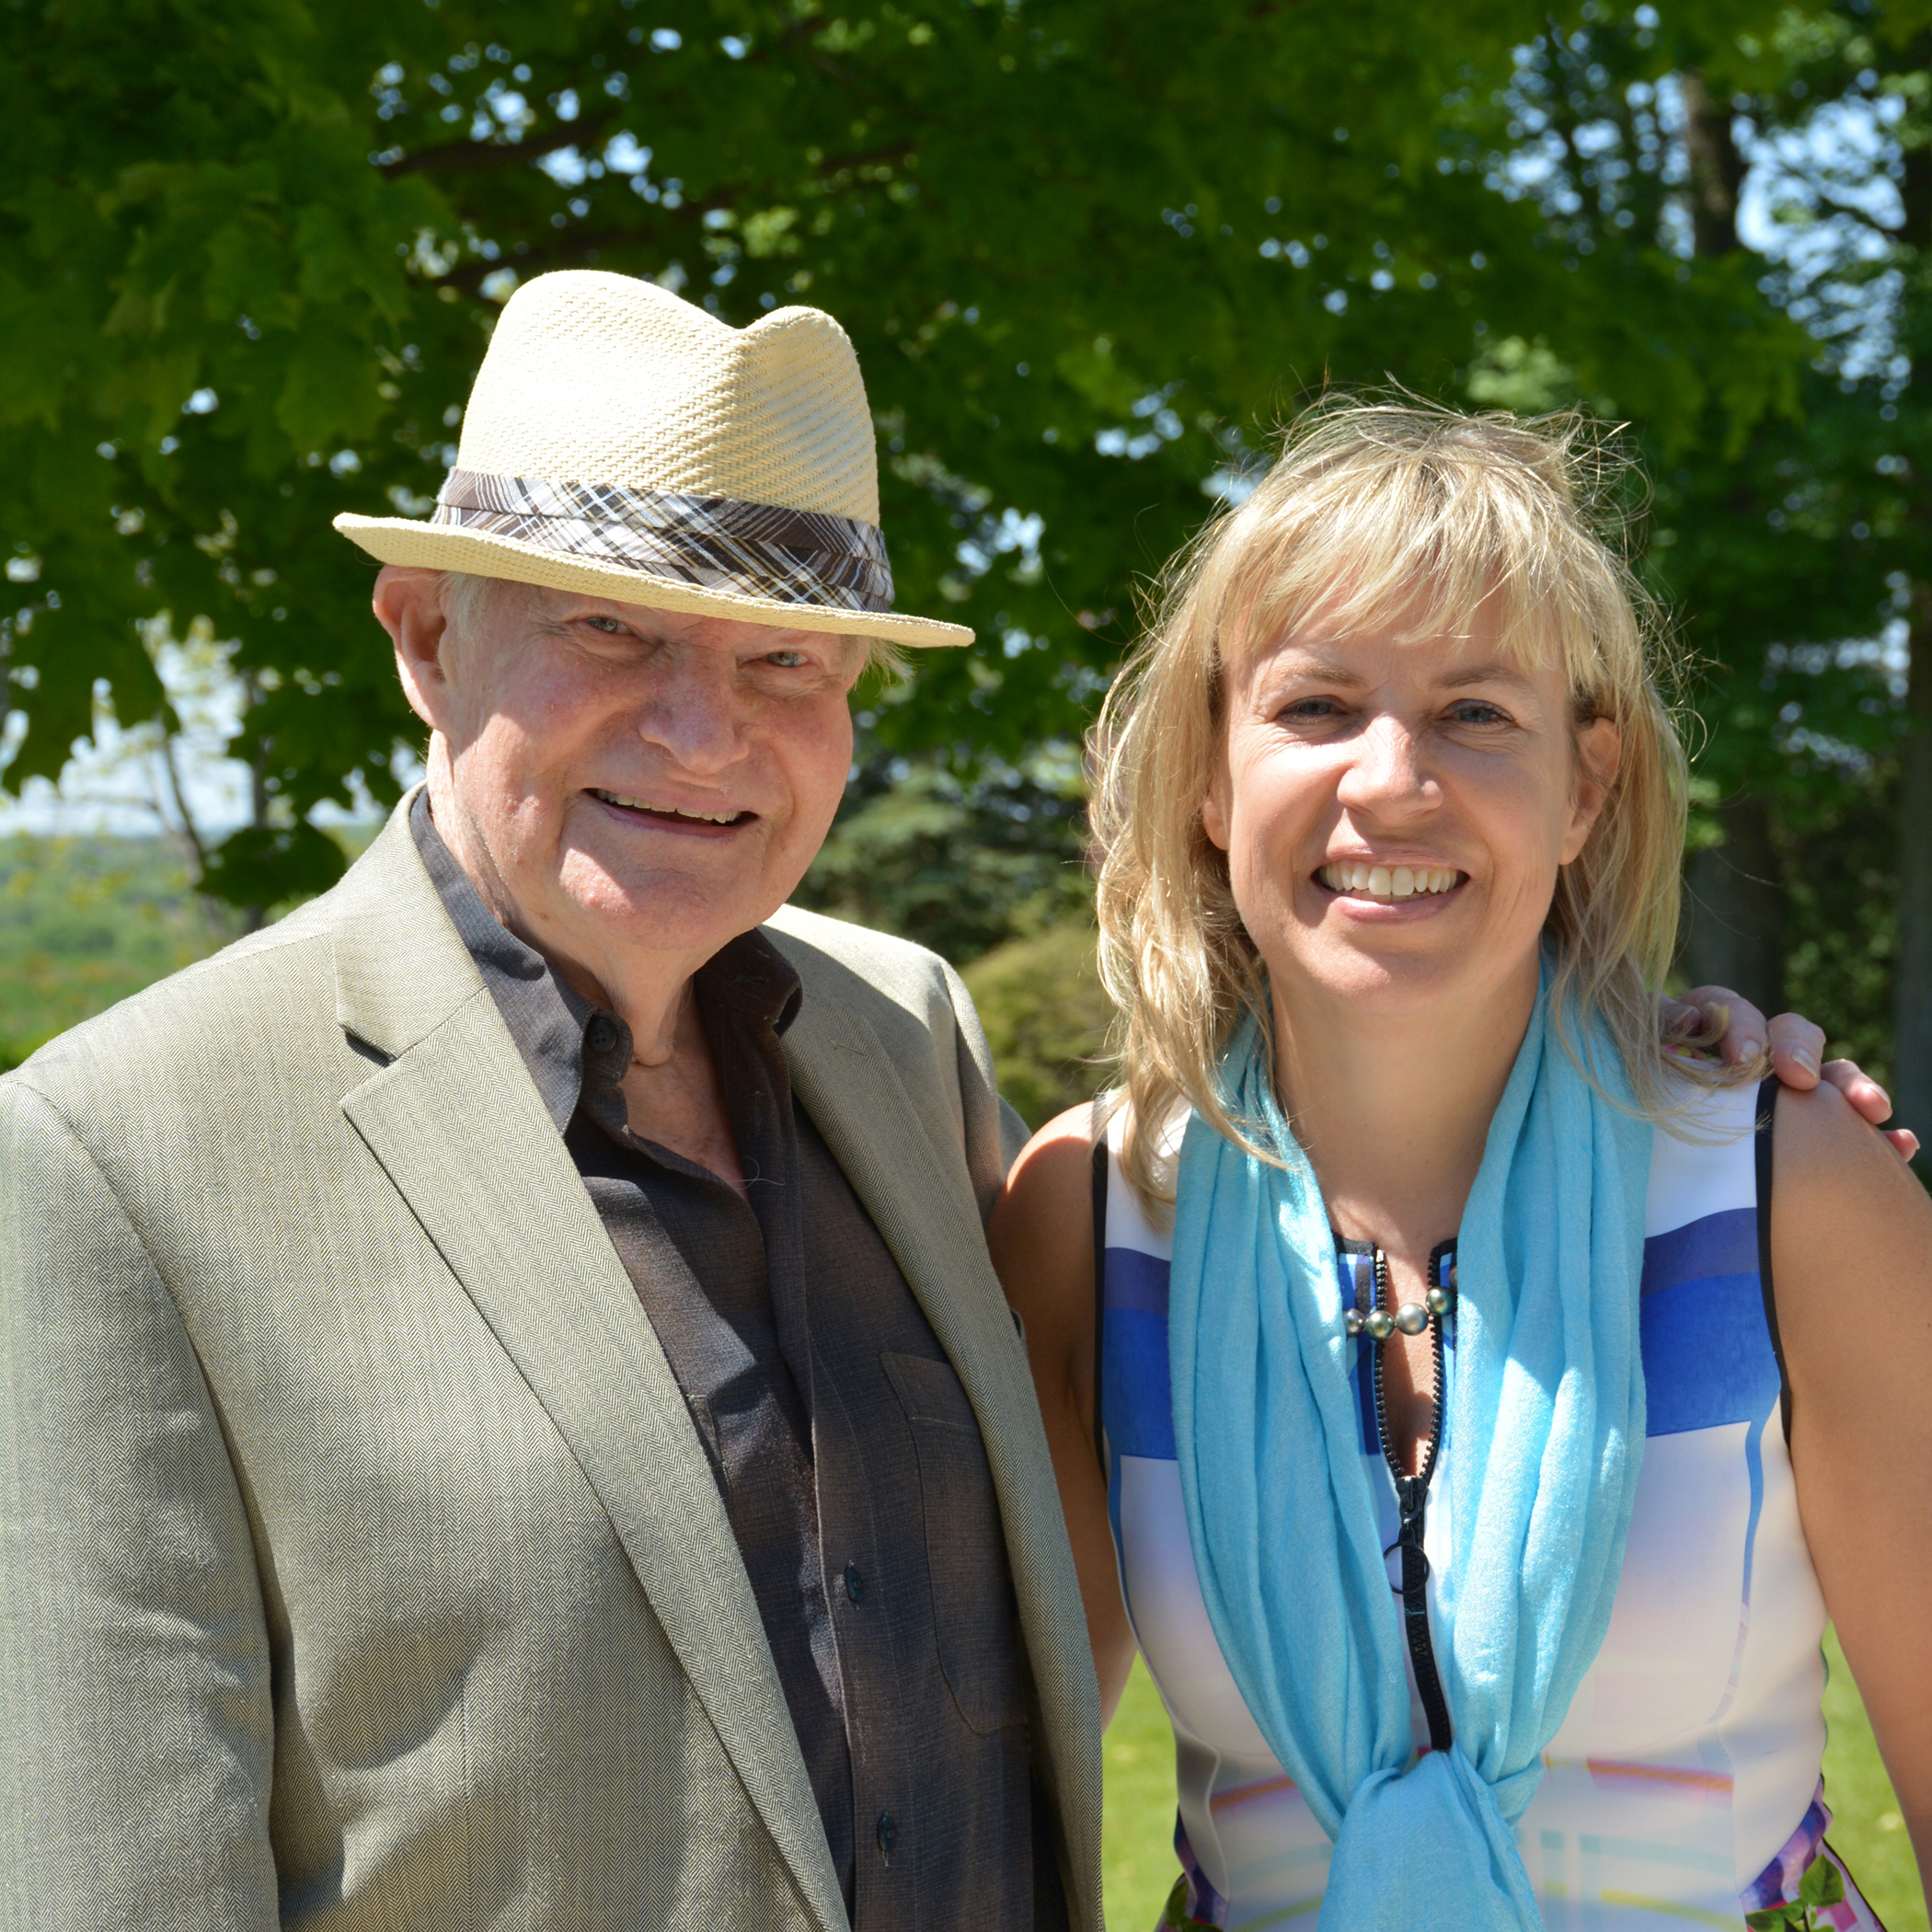 Morden Yolles and Katharine Harvey